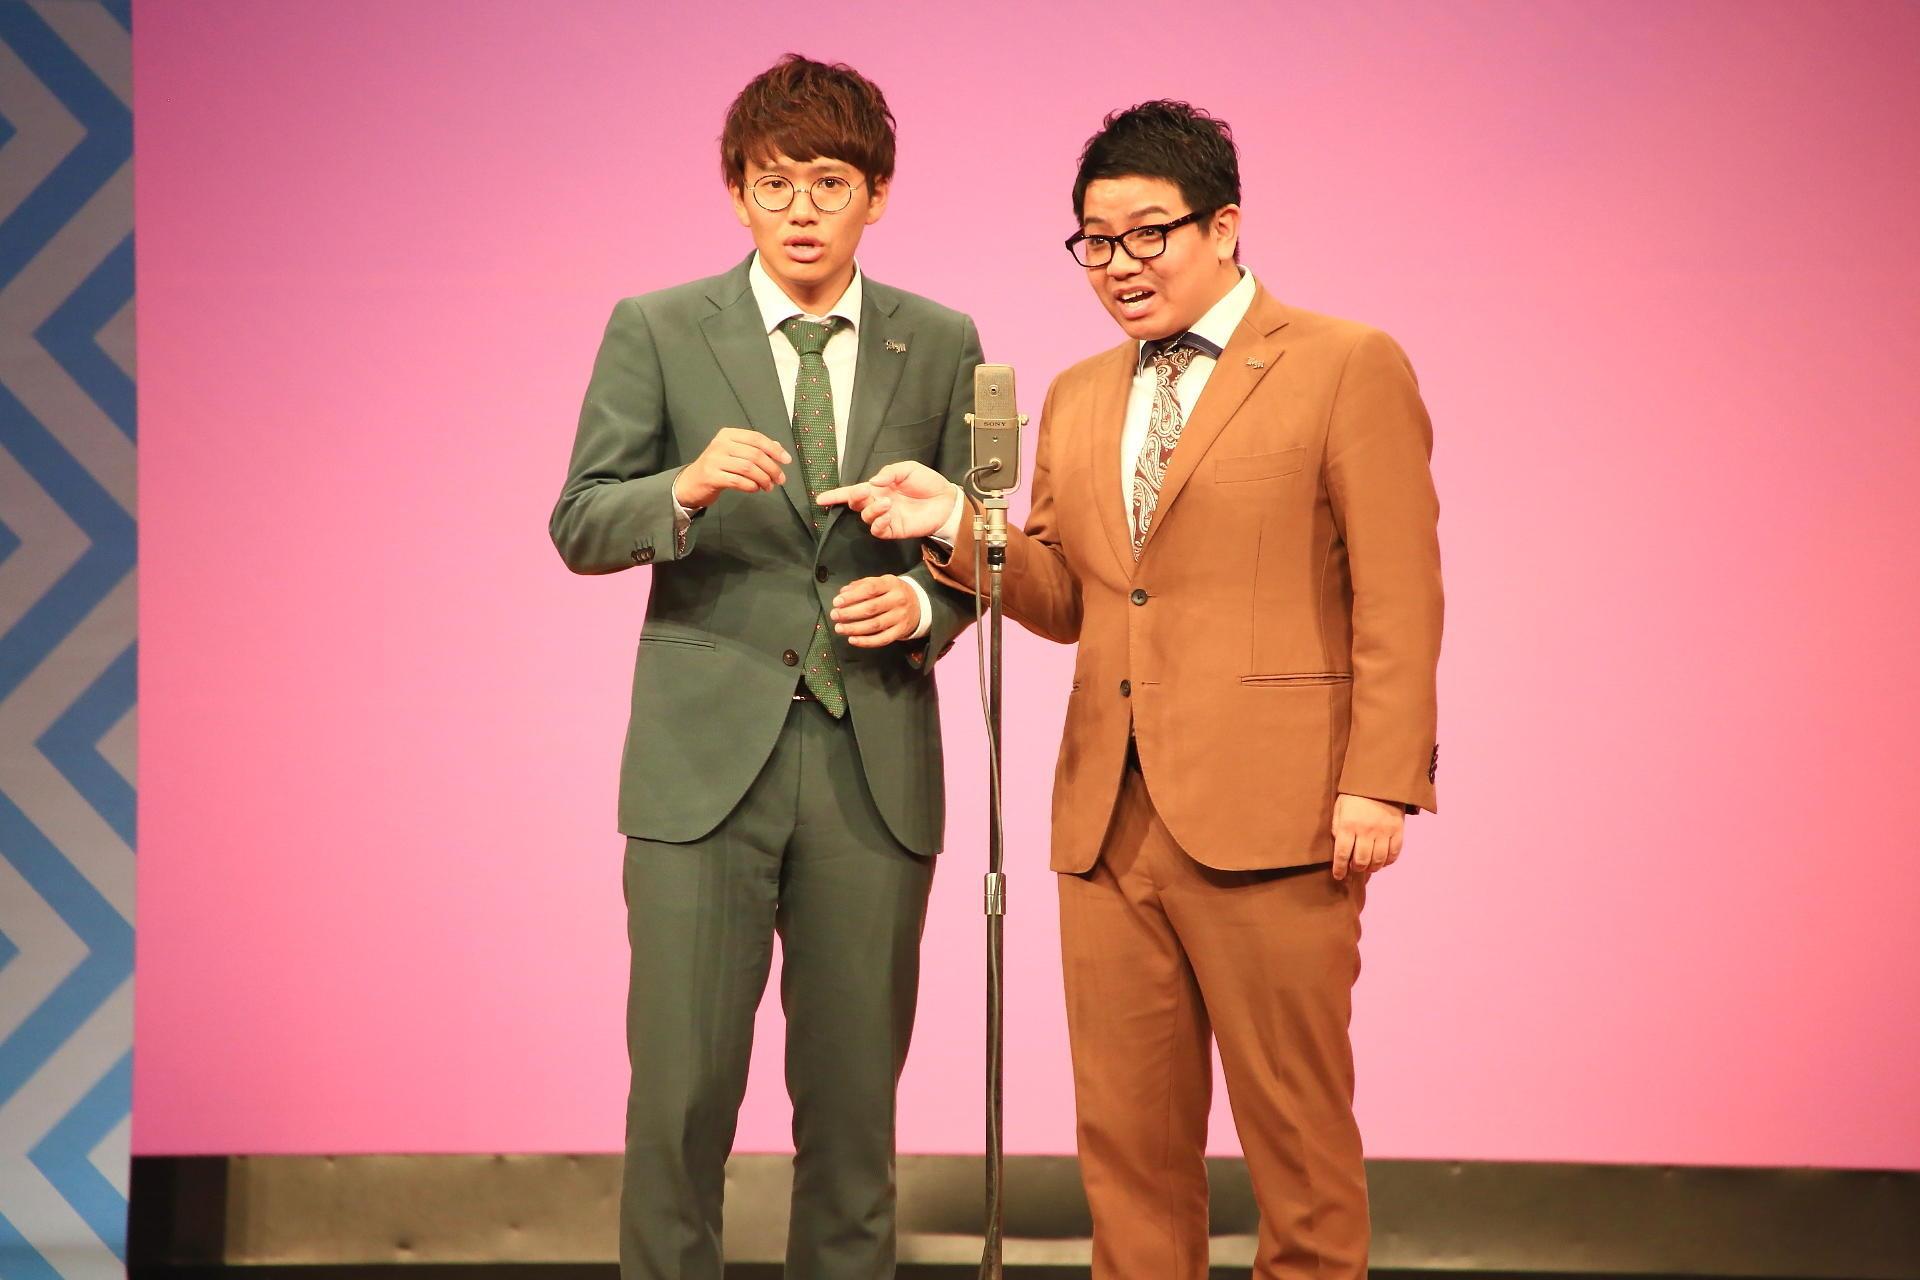 http://news.yoshimoto.co.jp/20171112095750-09e41f75cc2acd64afb926b3720bc6c9a92401da.jpg